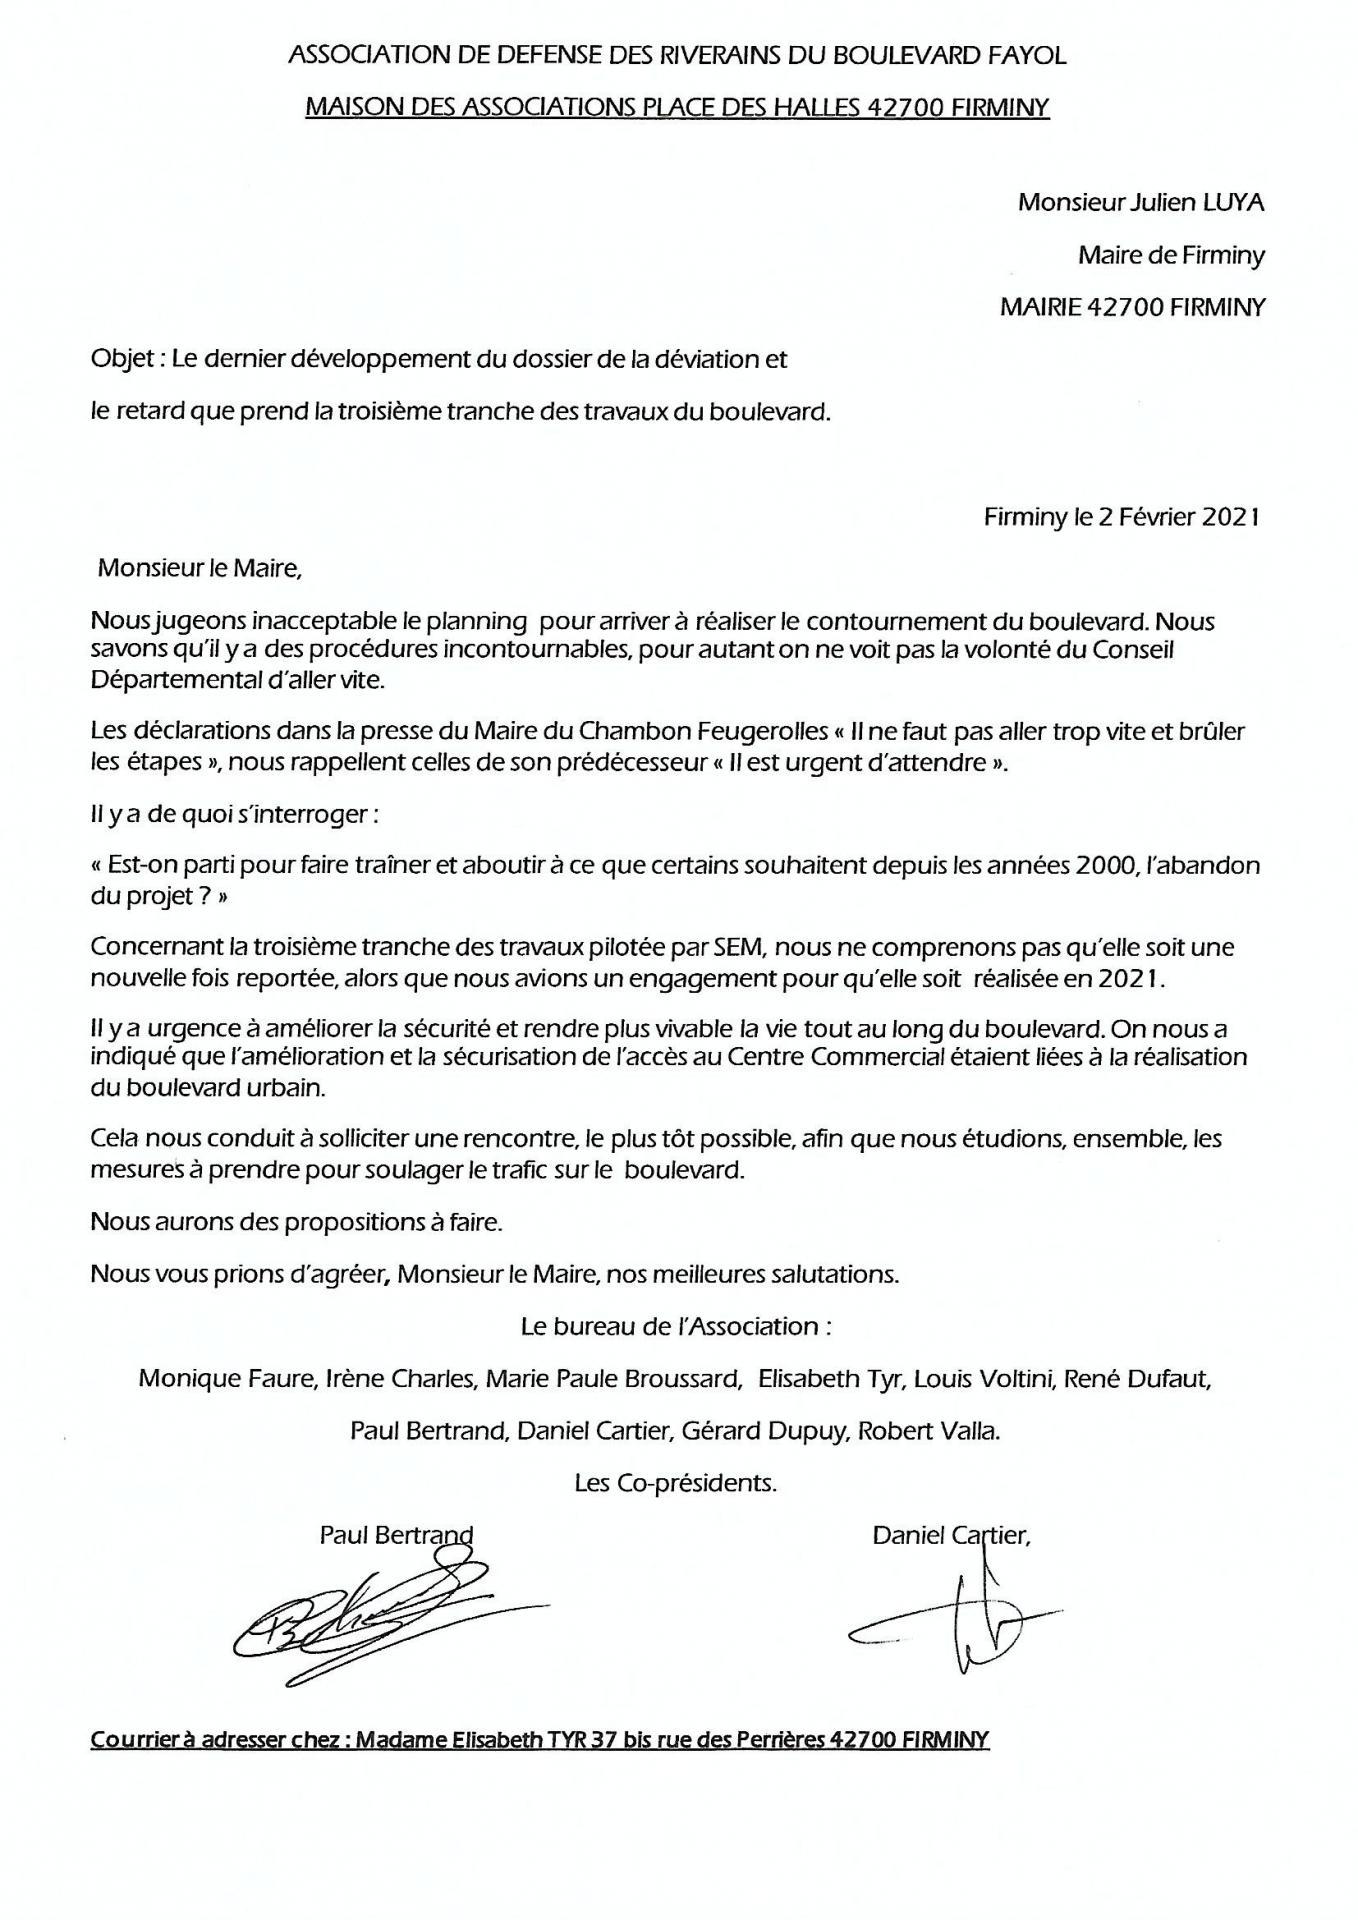 Lettre au Maire J. Luya 02 02 2021 JPG